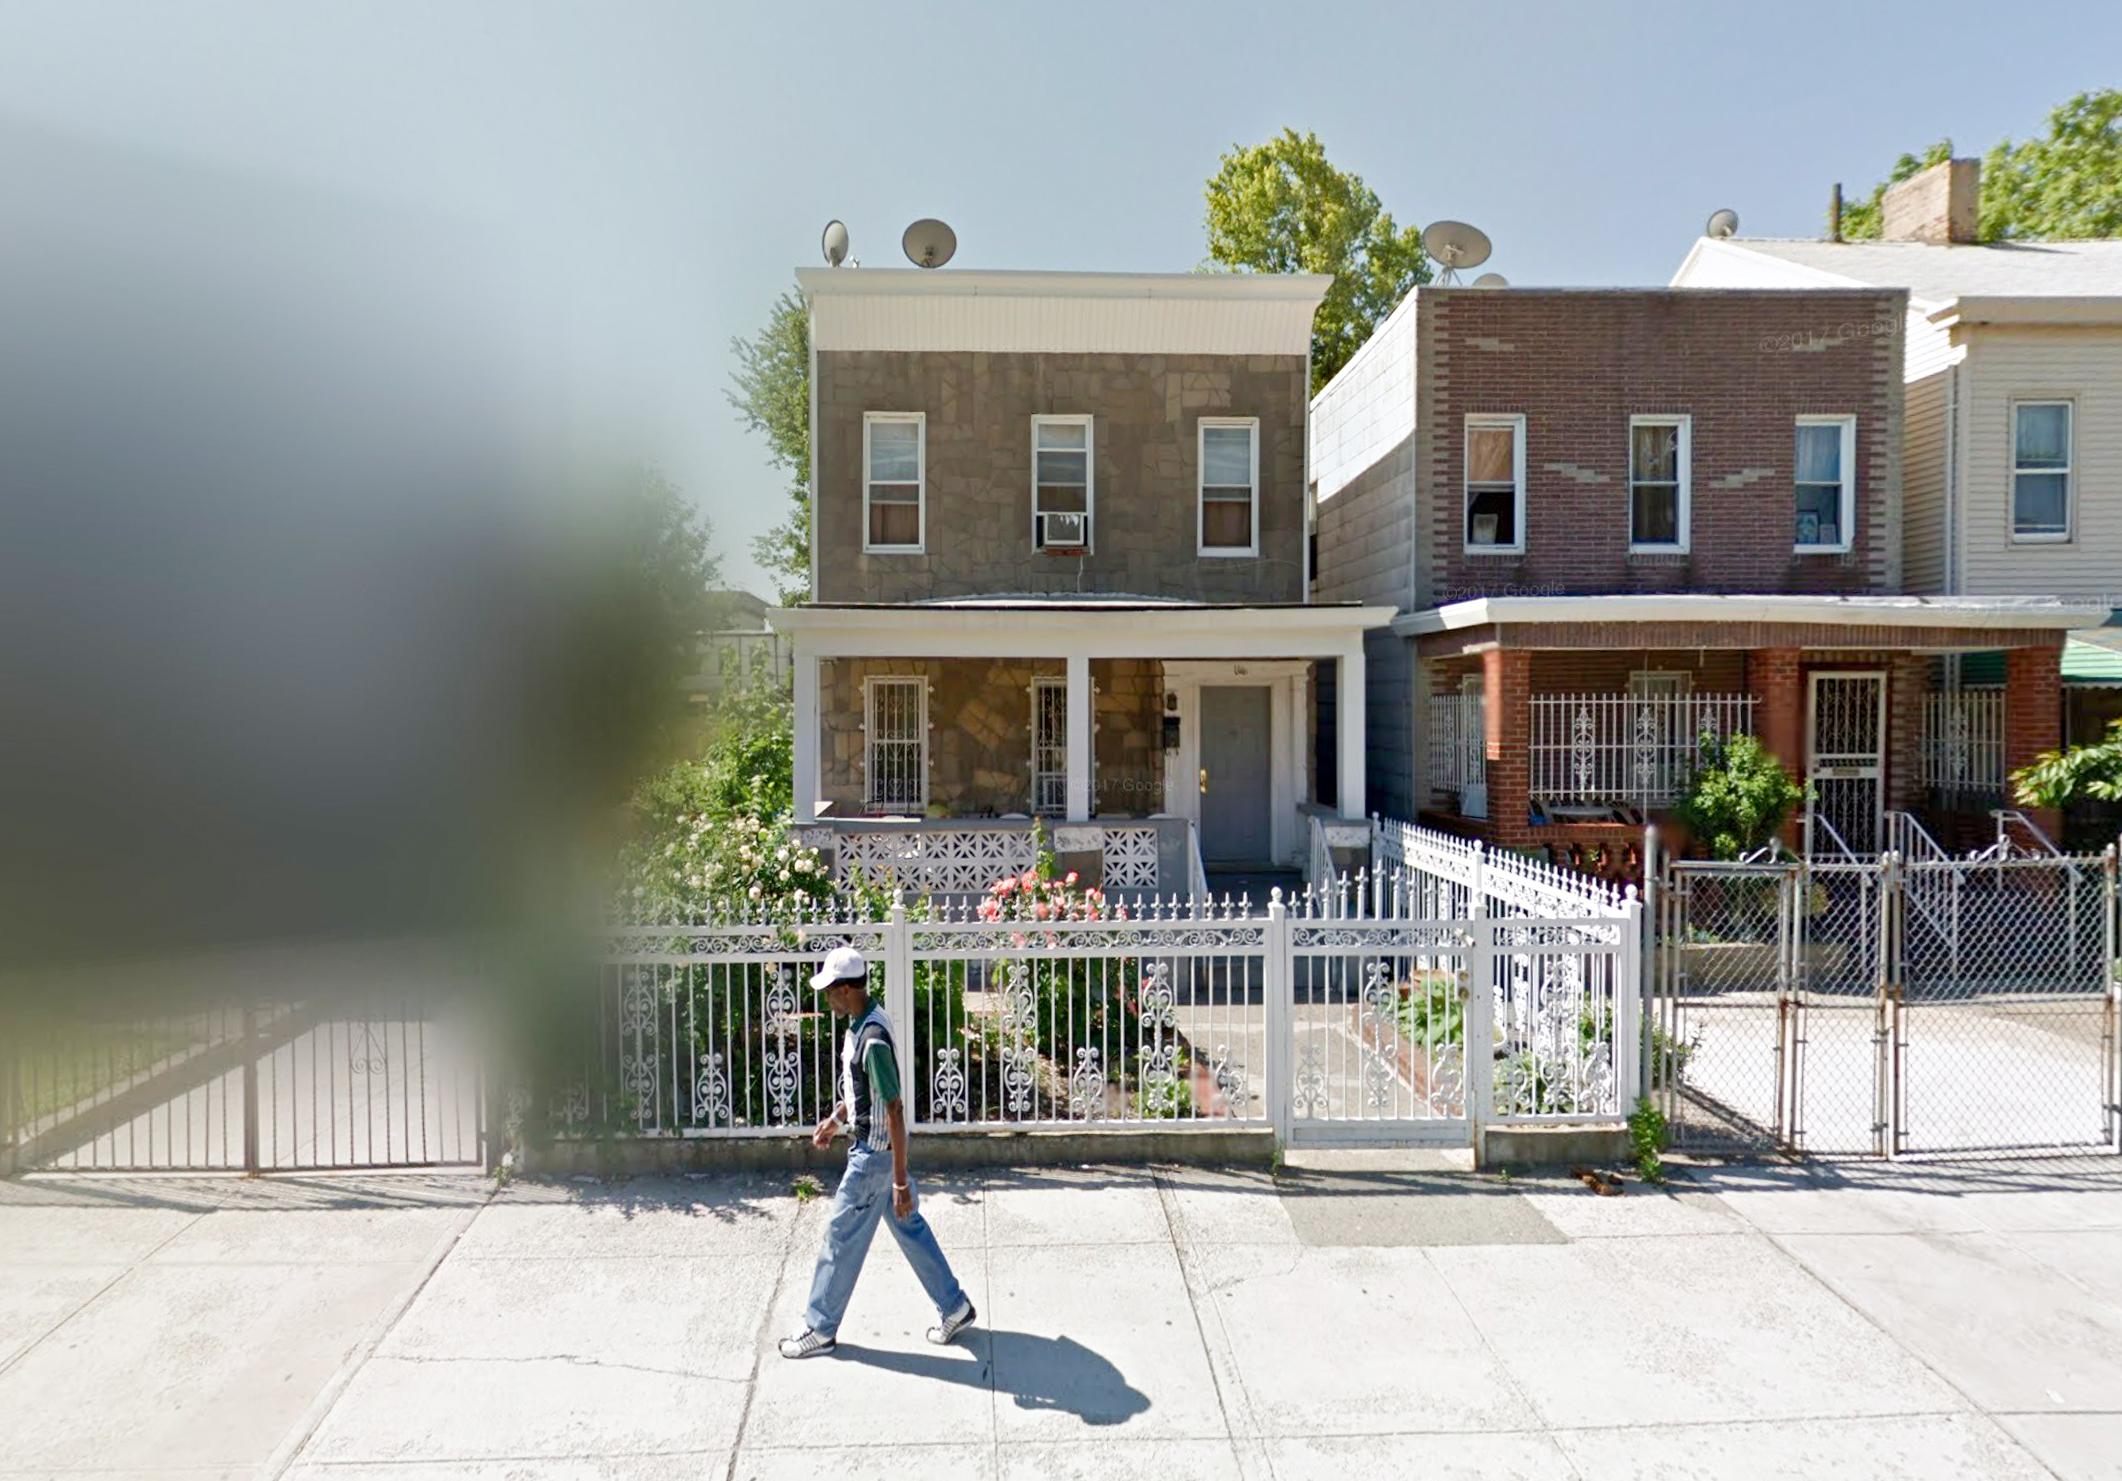 146 Erasmus Street, via Google Maps